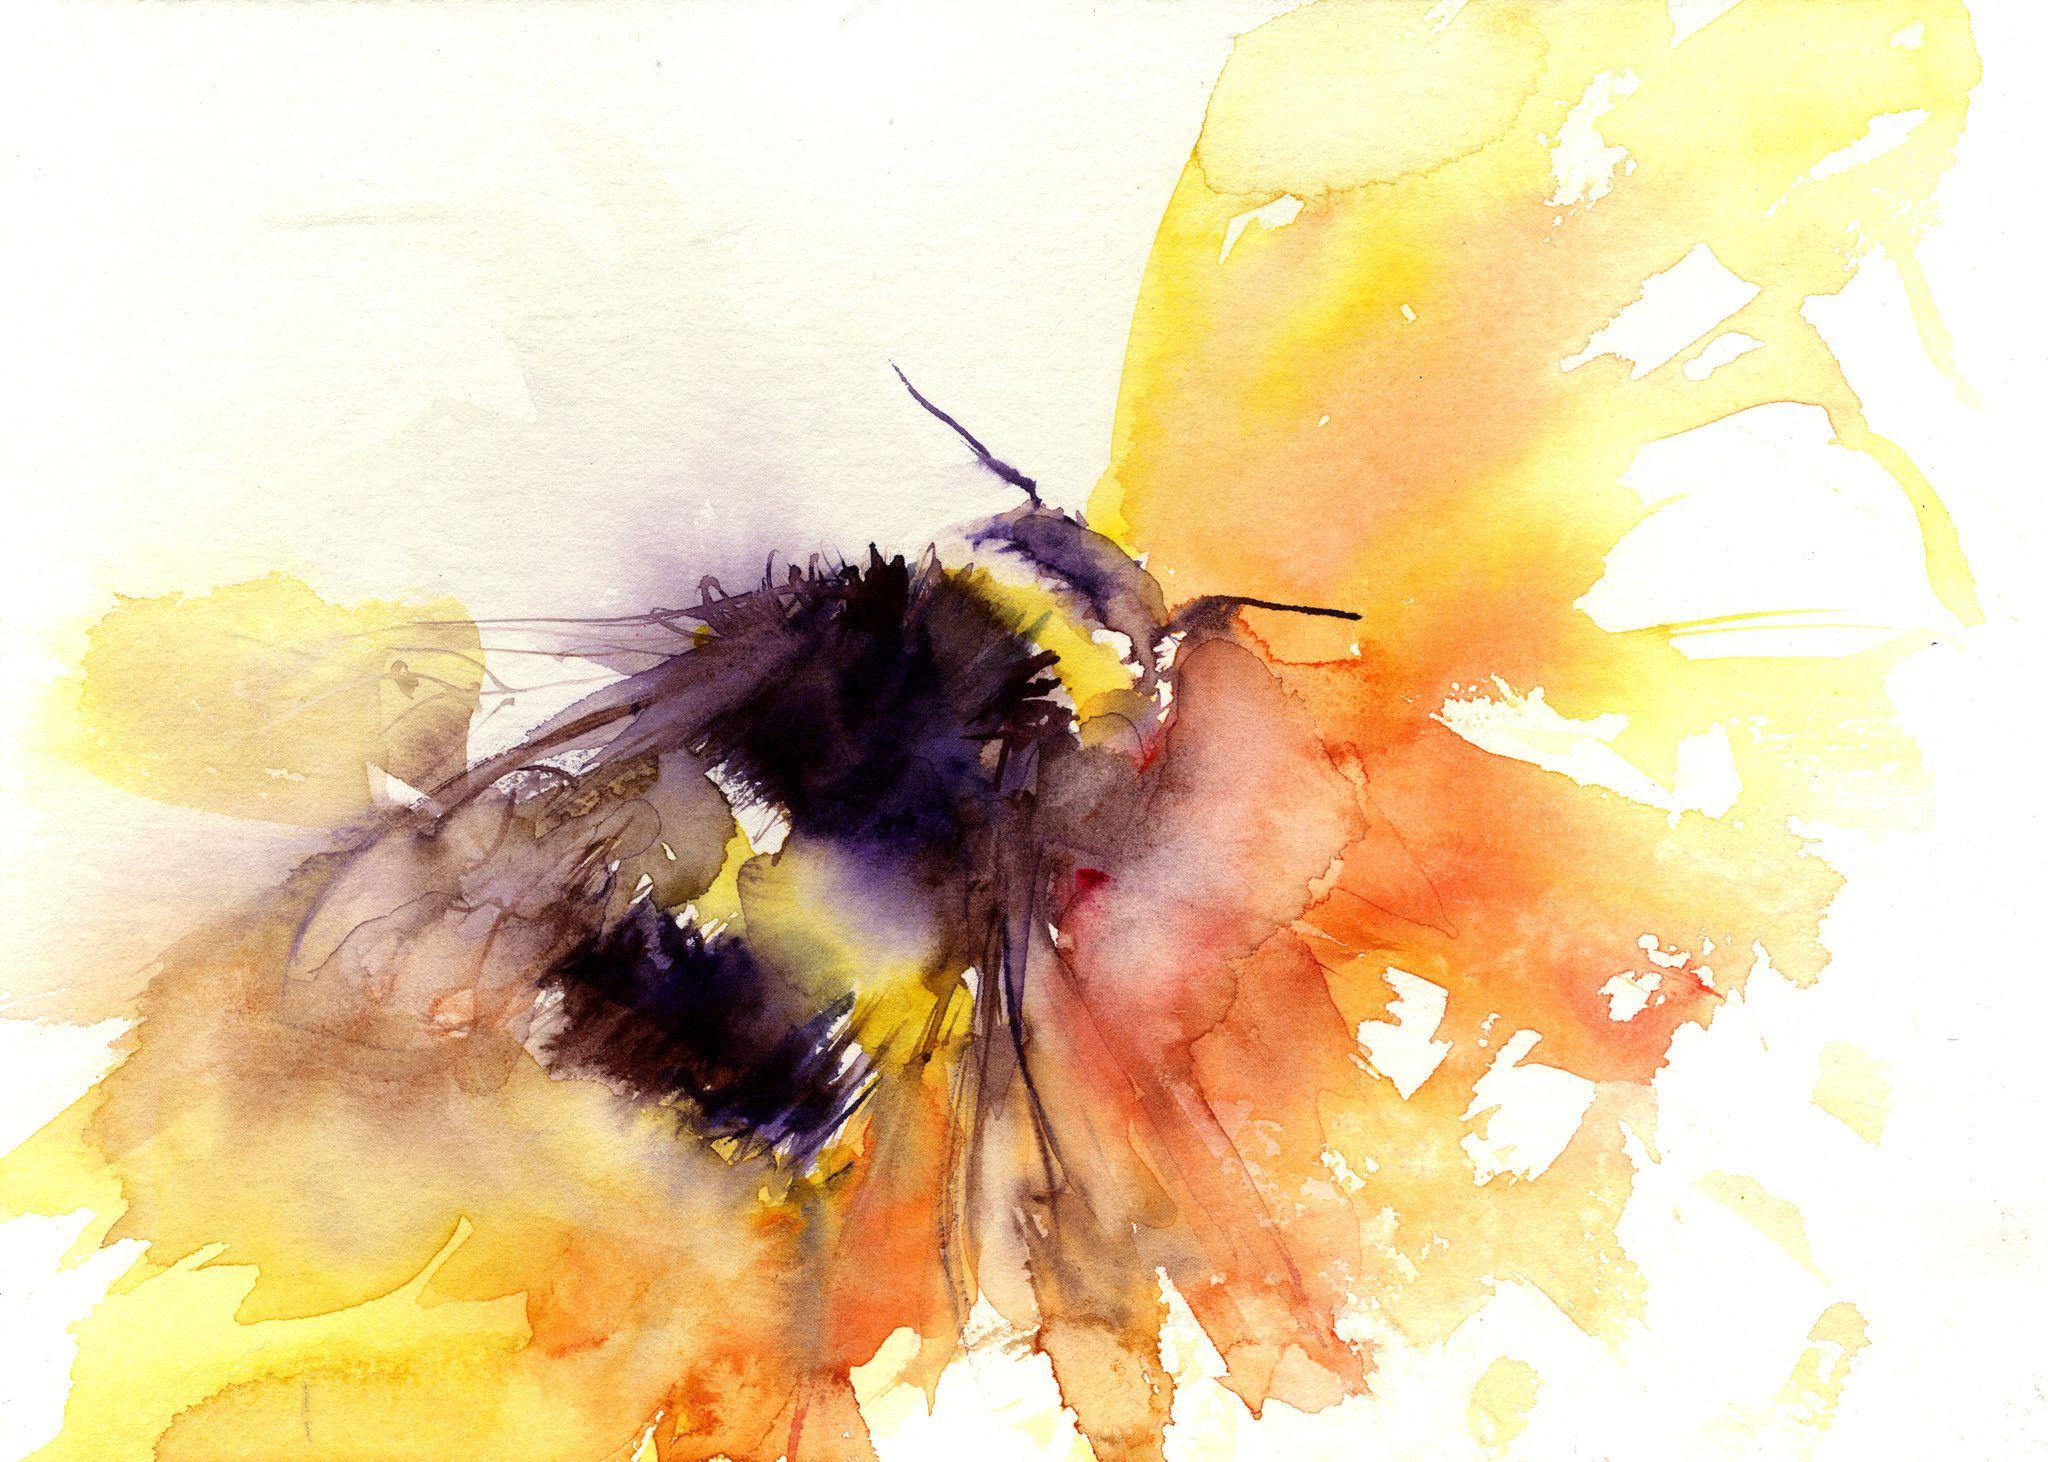 jen buckley art limited editon print of my original bumble bee